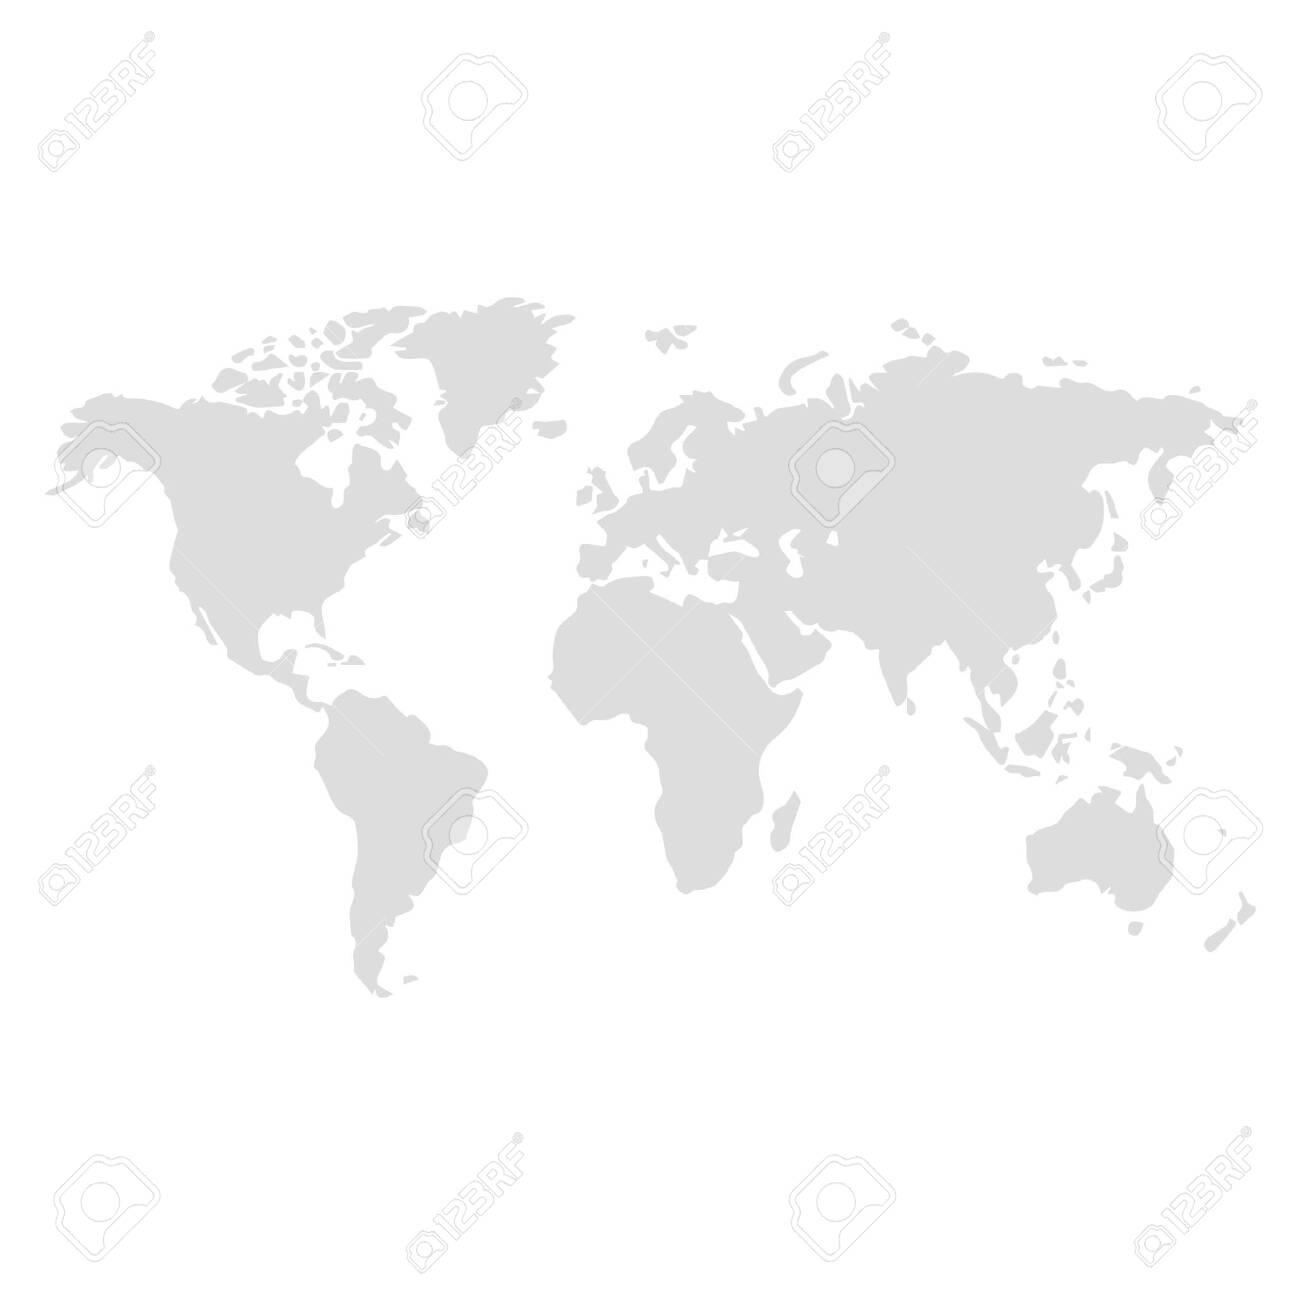 world map illustration vector - 126511445